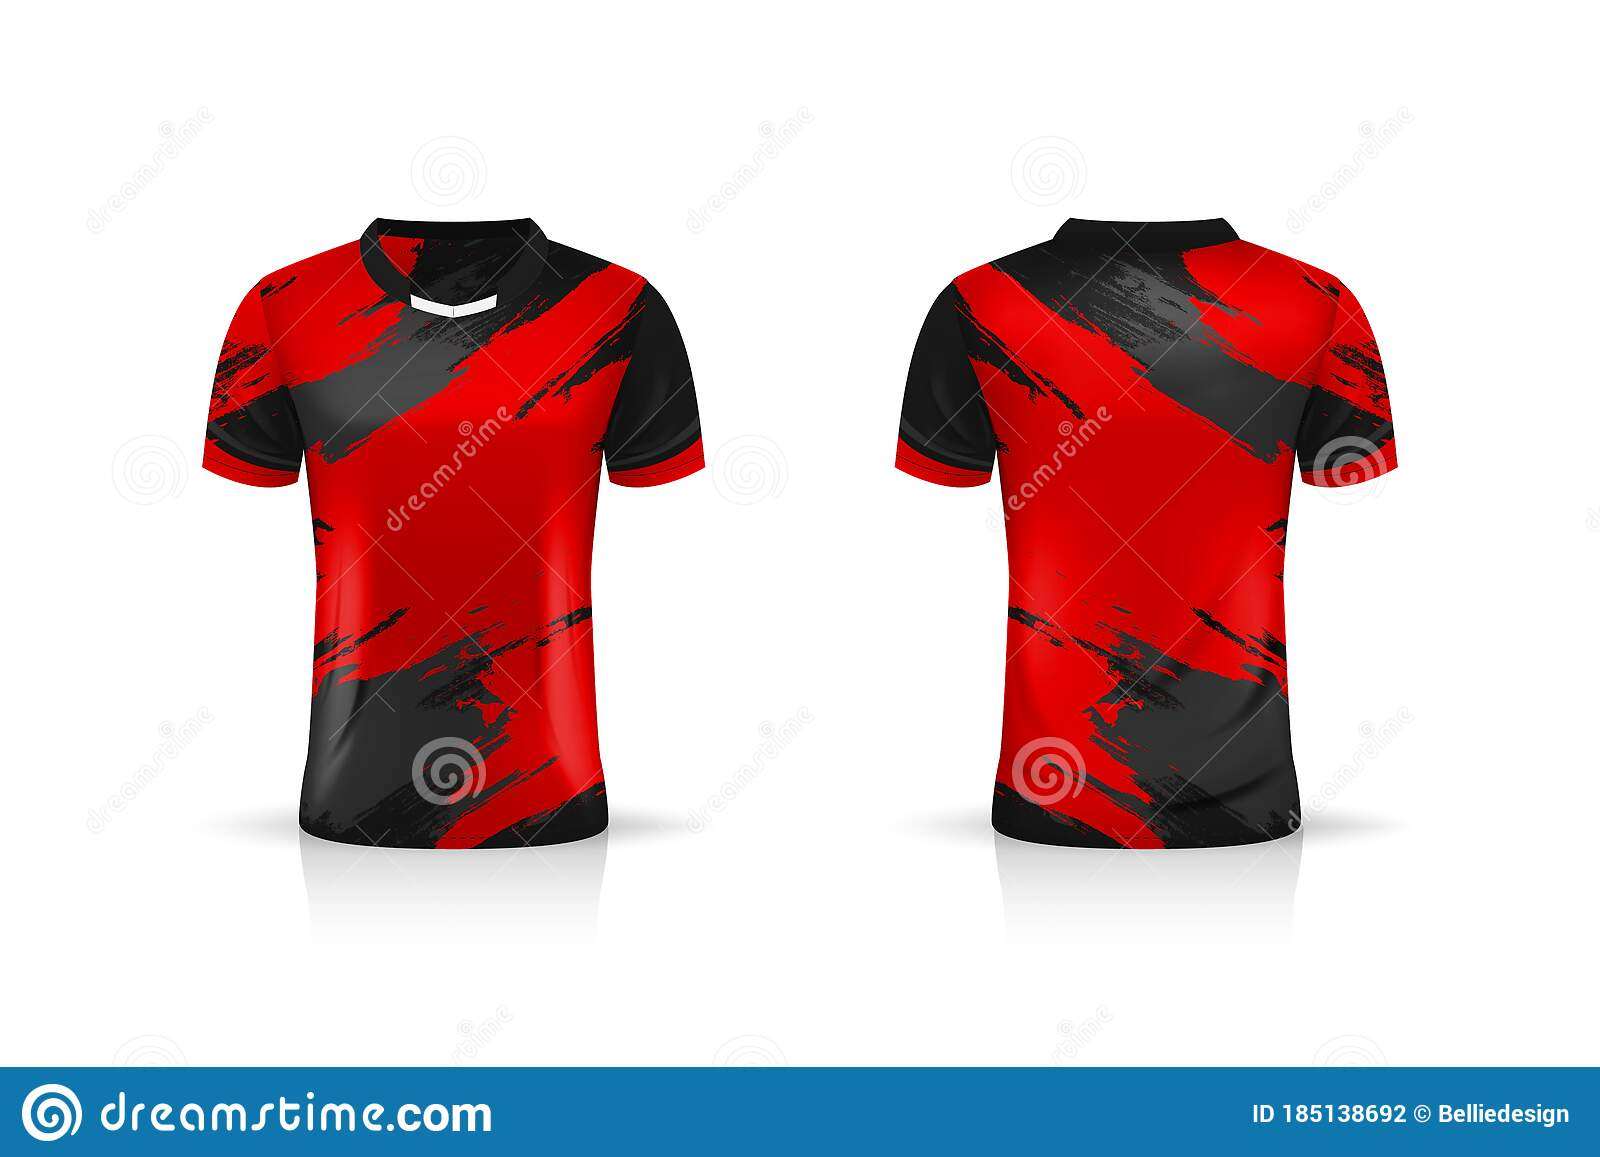 Specification Soccer Sport Esport Gaming T Shirt Jersey Template Mock Up Uniform Vector Illustration Stock Vector Illustration Of Collar Soccer 185138692